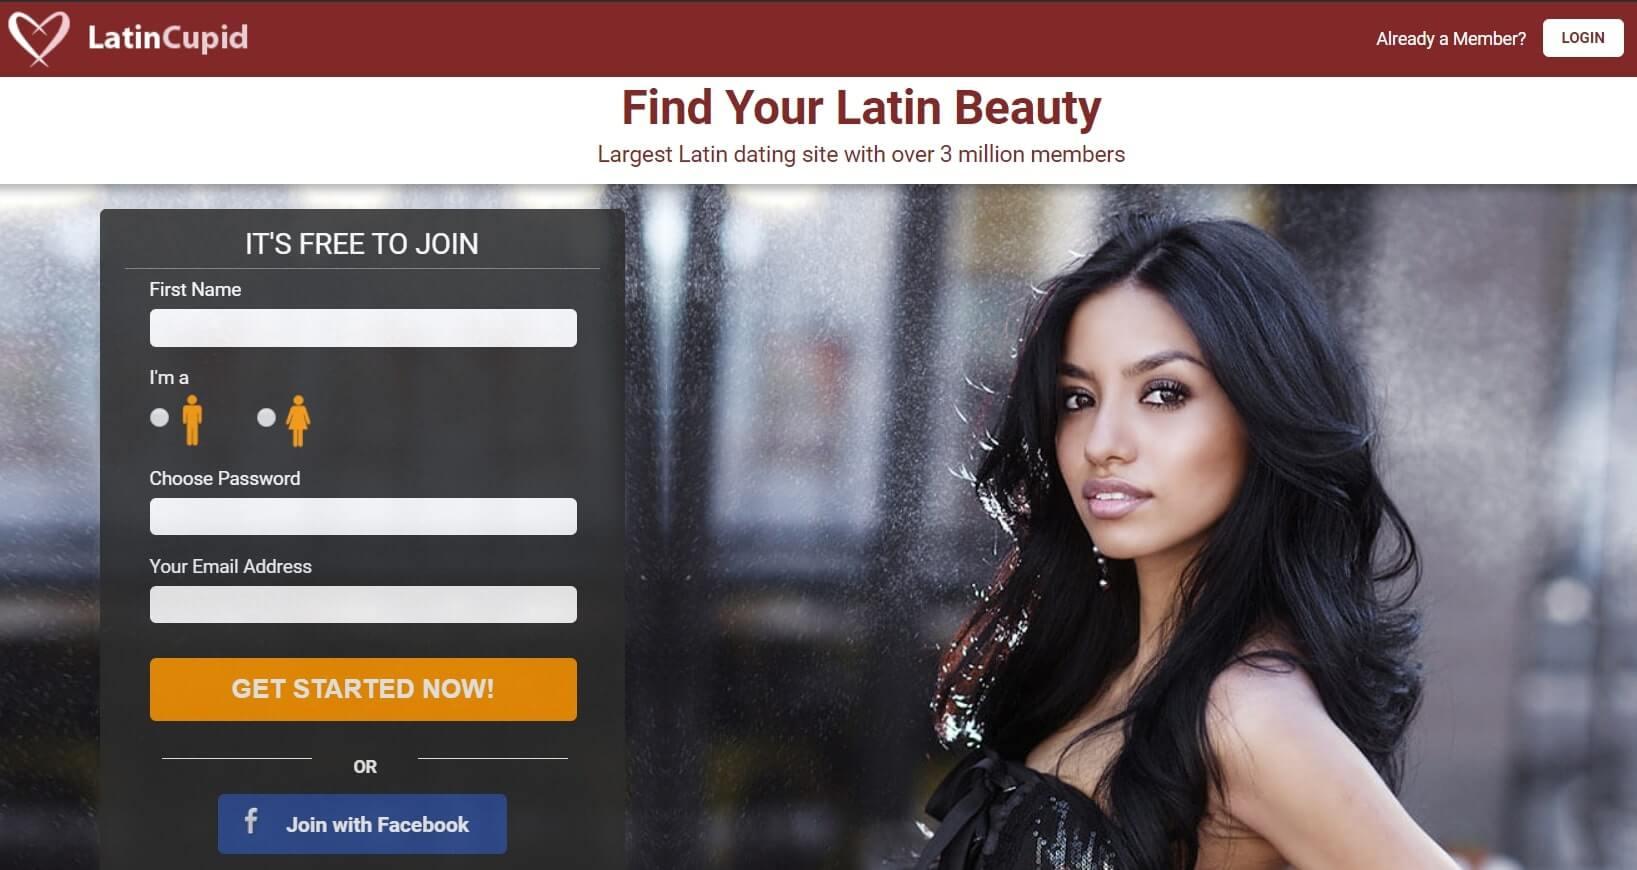 LatinCupid.com Registration